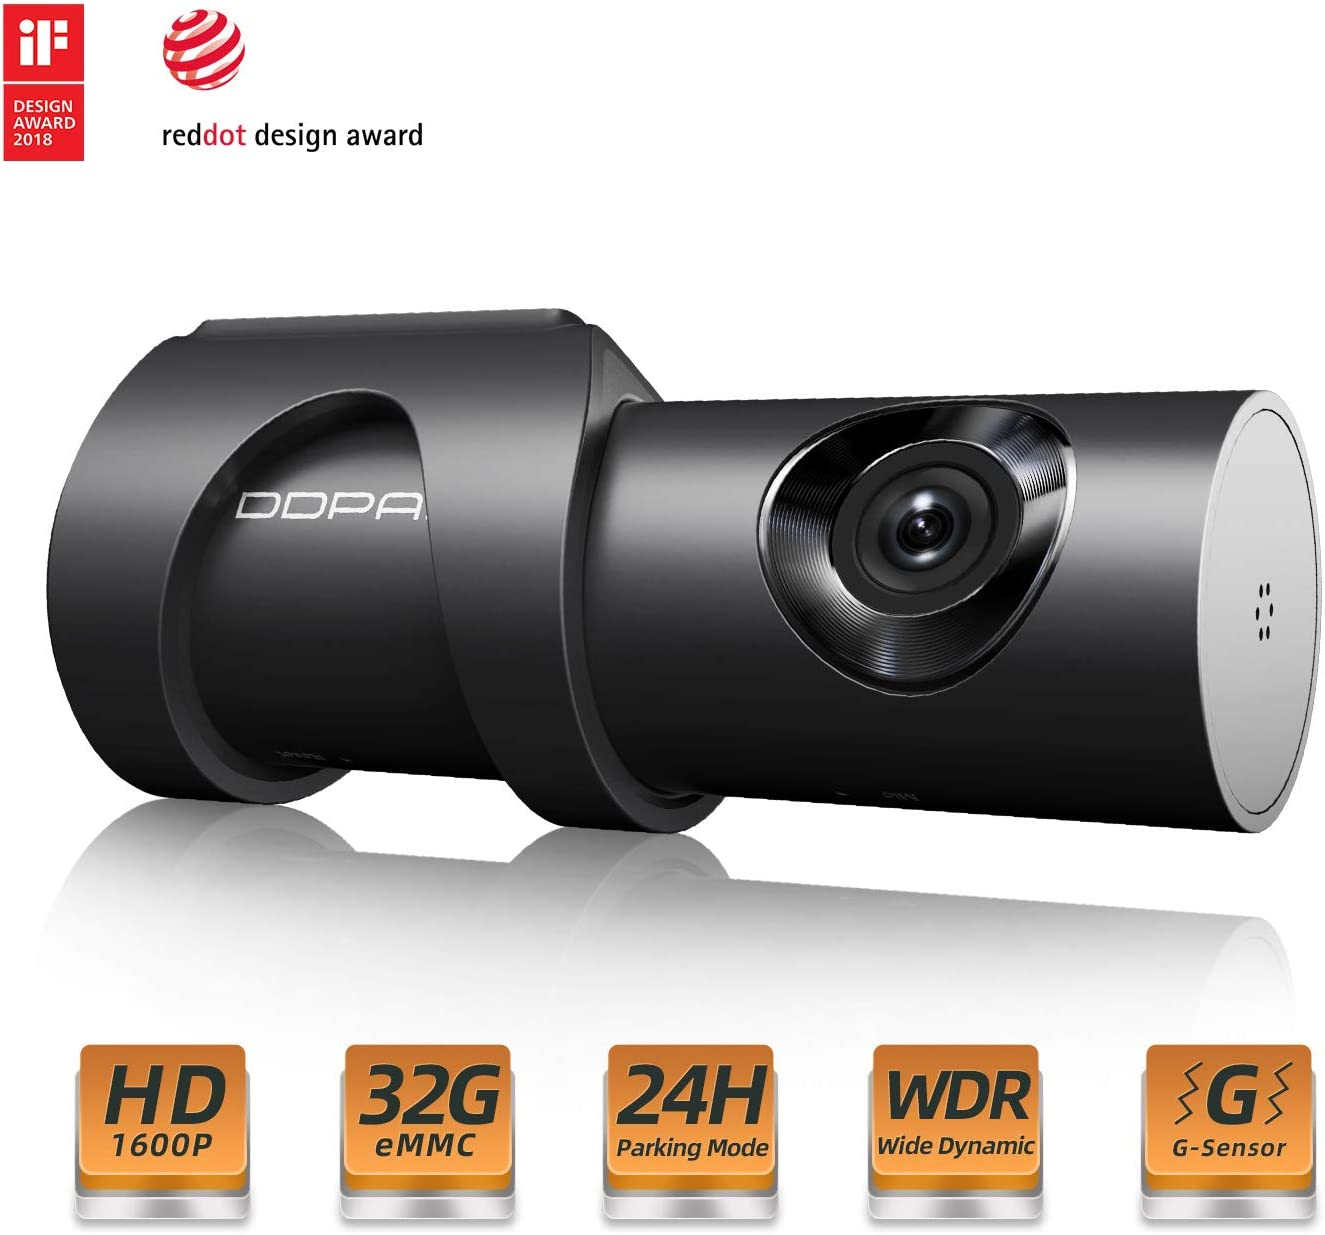 DDPAI 1600P HD Dash Camera Built-in 32g Storage Wi-Fi Wide Angle Dashboard Camera, Car DVR Vehicle Dash Cam with F1.8, WDR, Night Vision, G-Sensor, ...